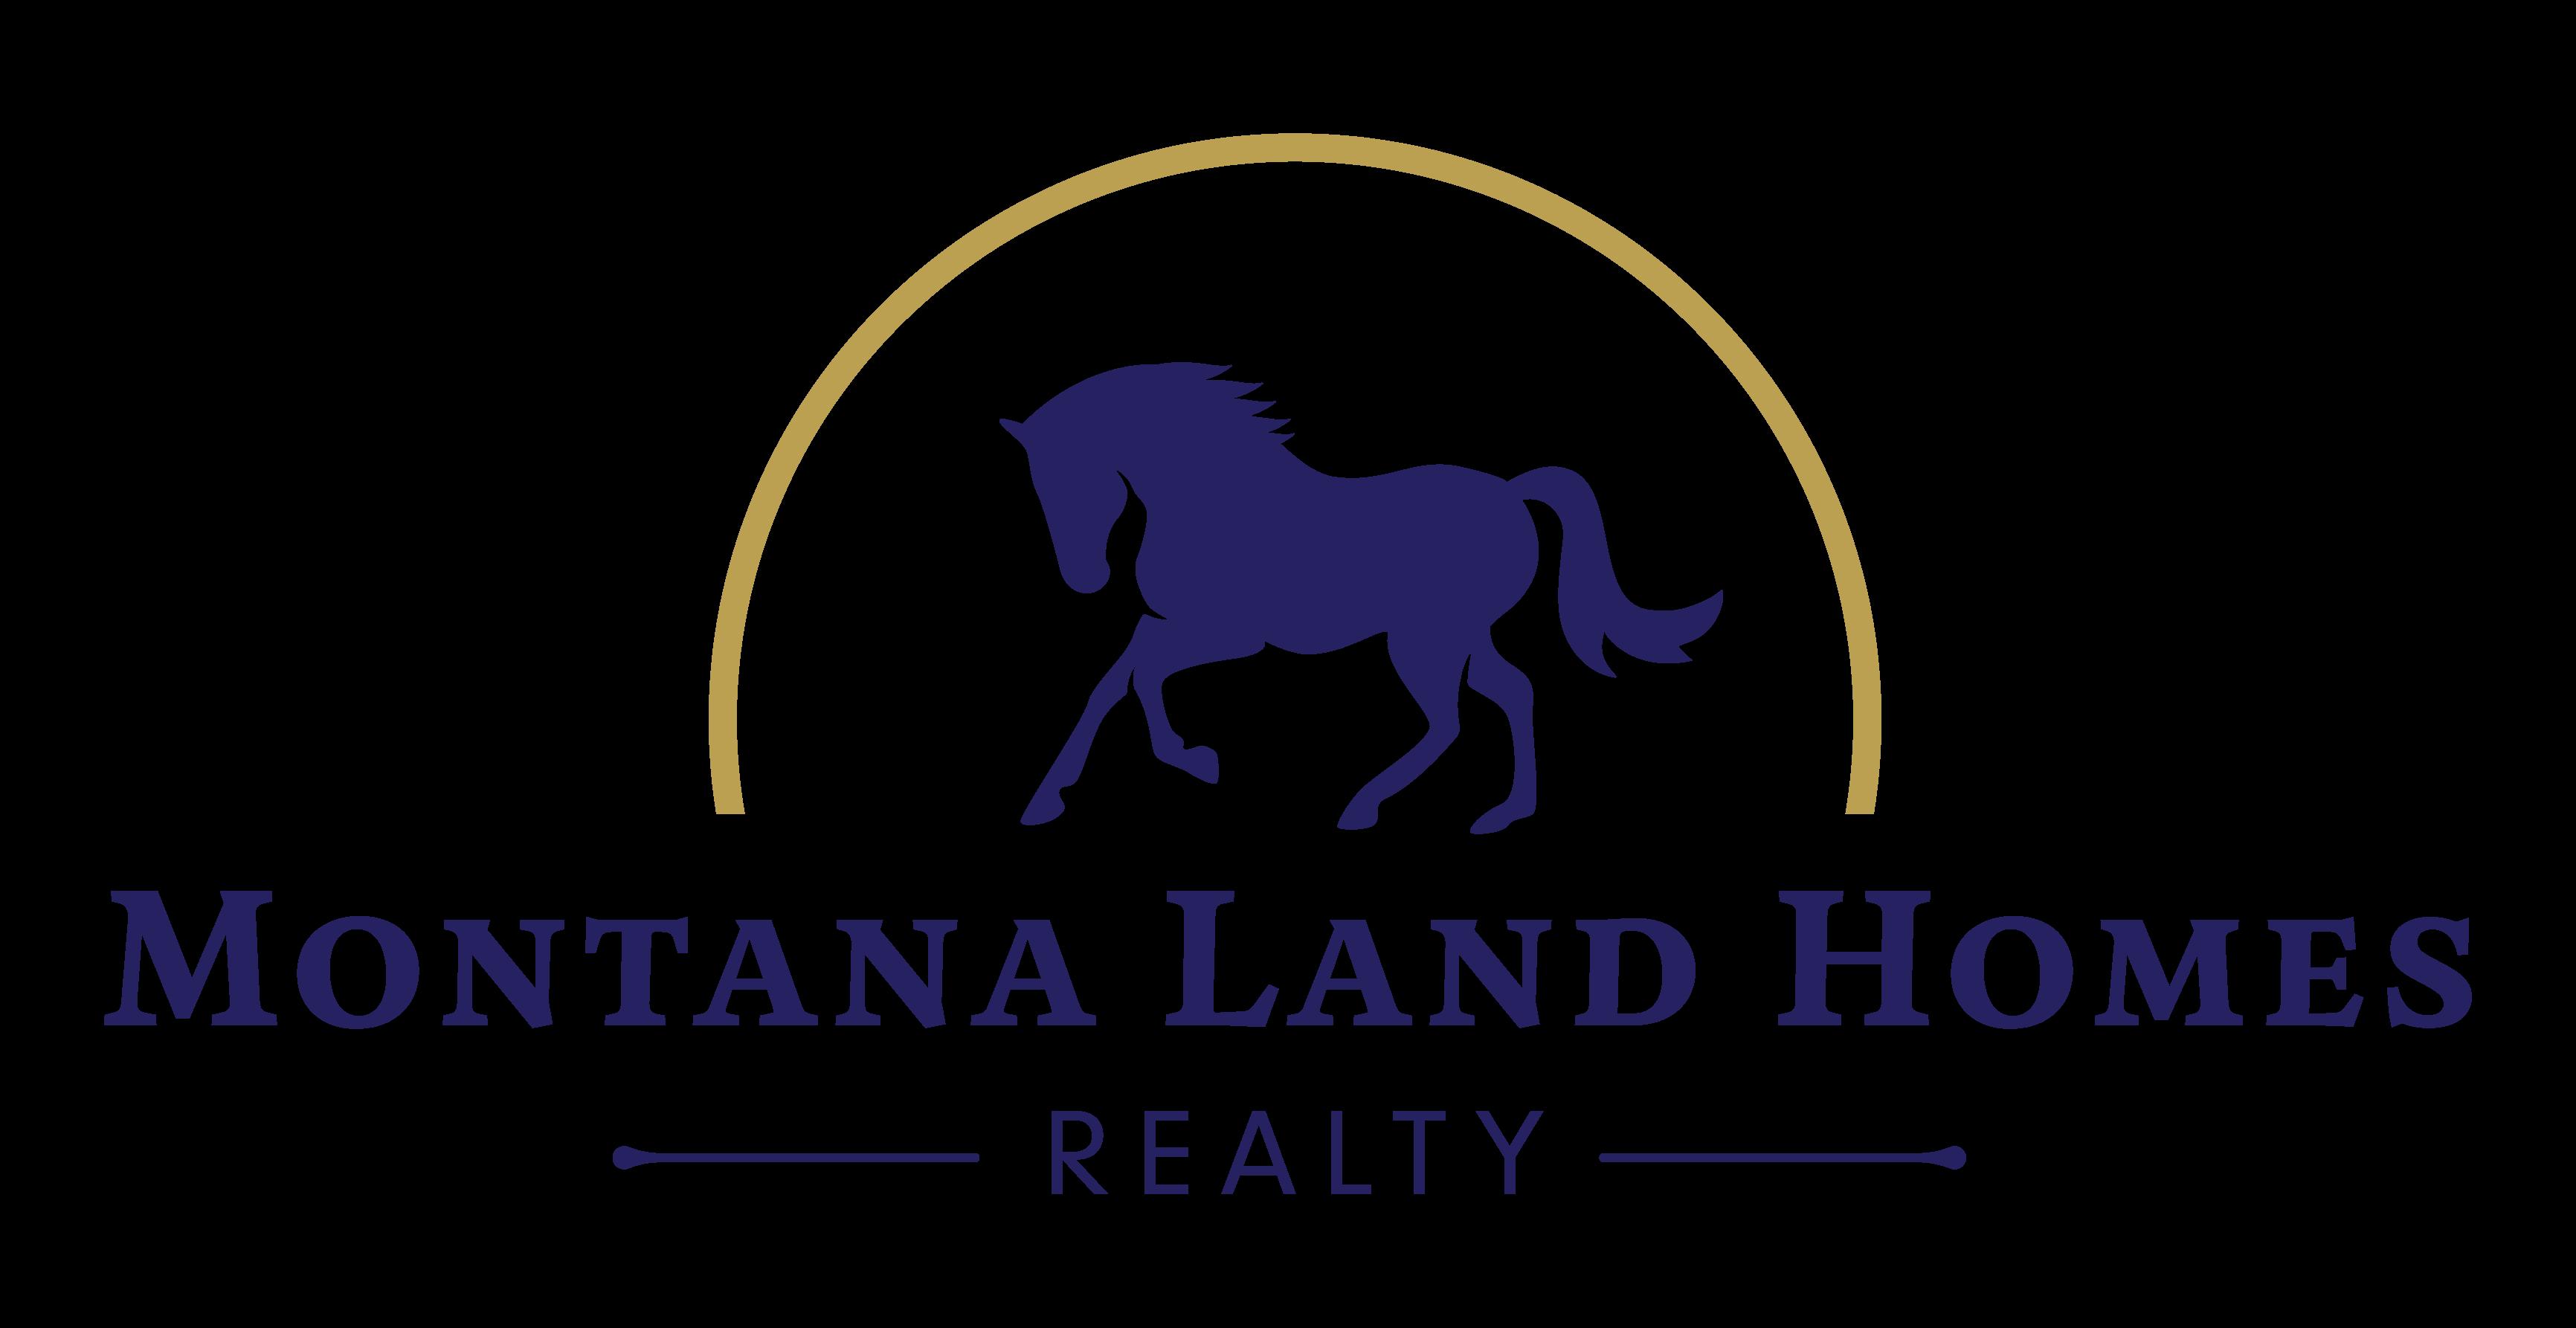 Montana Land Home Realty